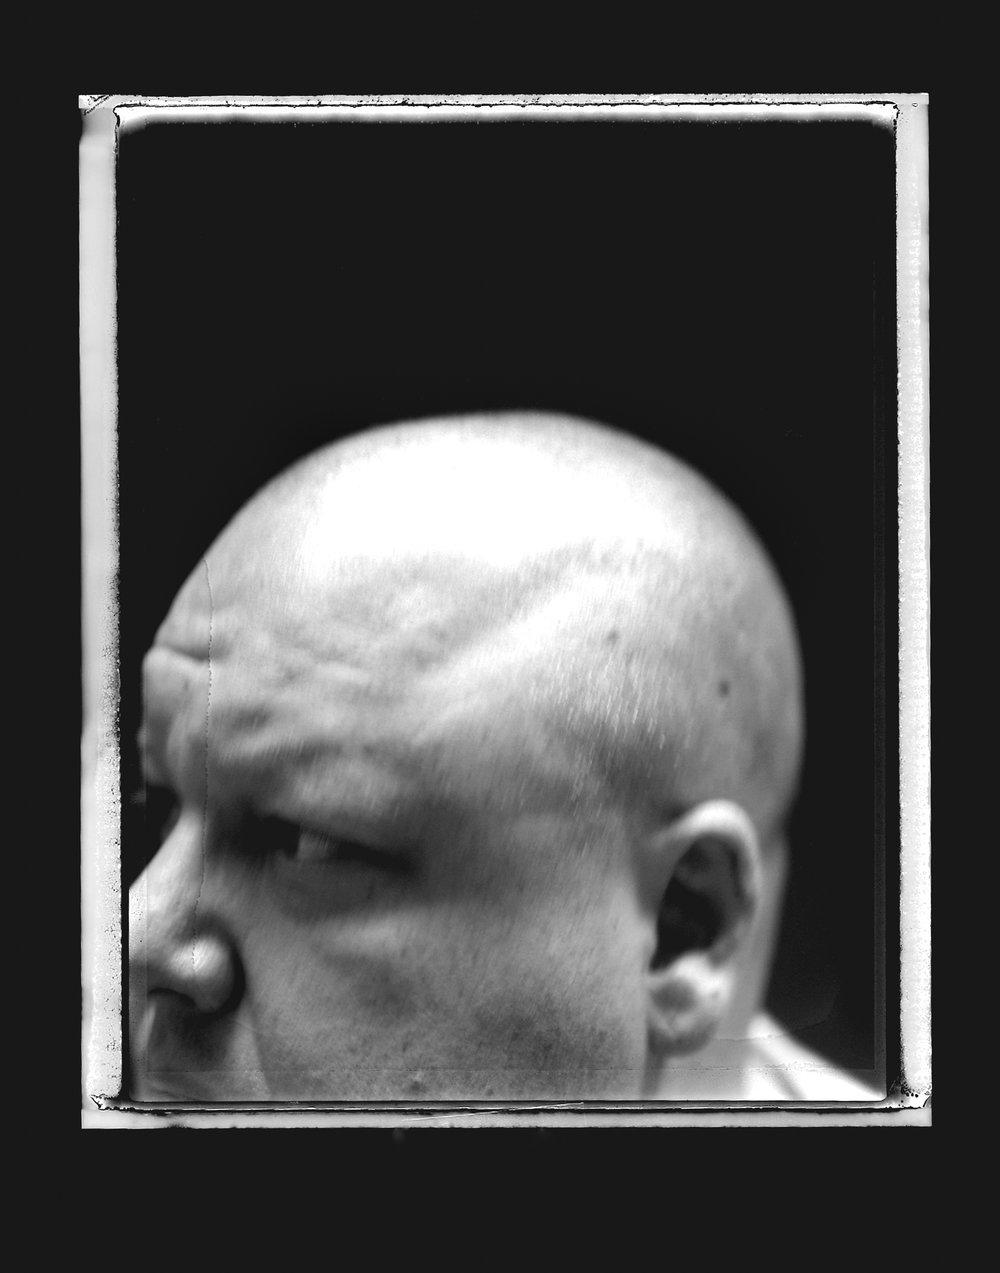 frankblackprint1.jpg